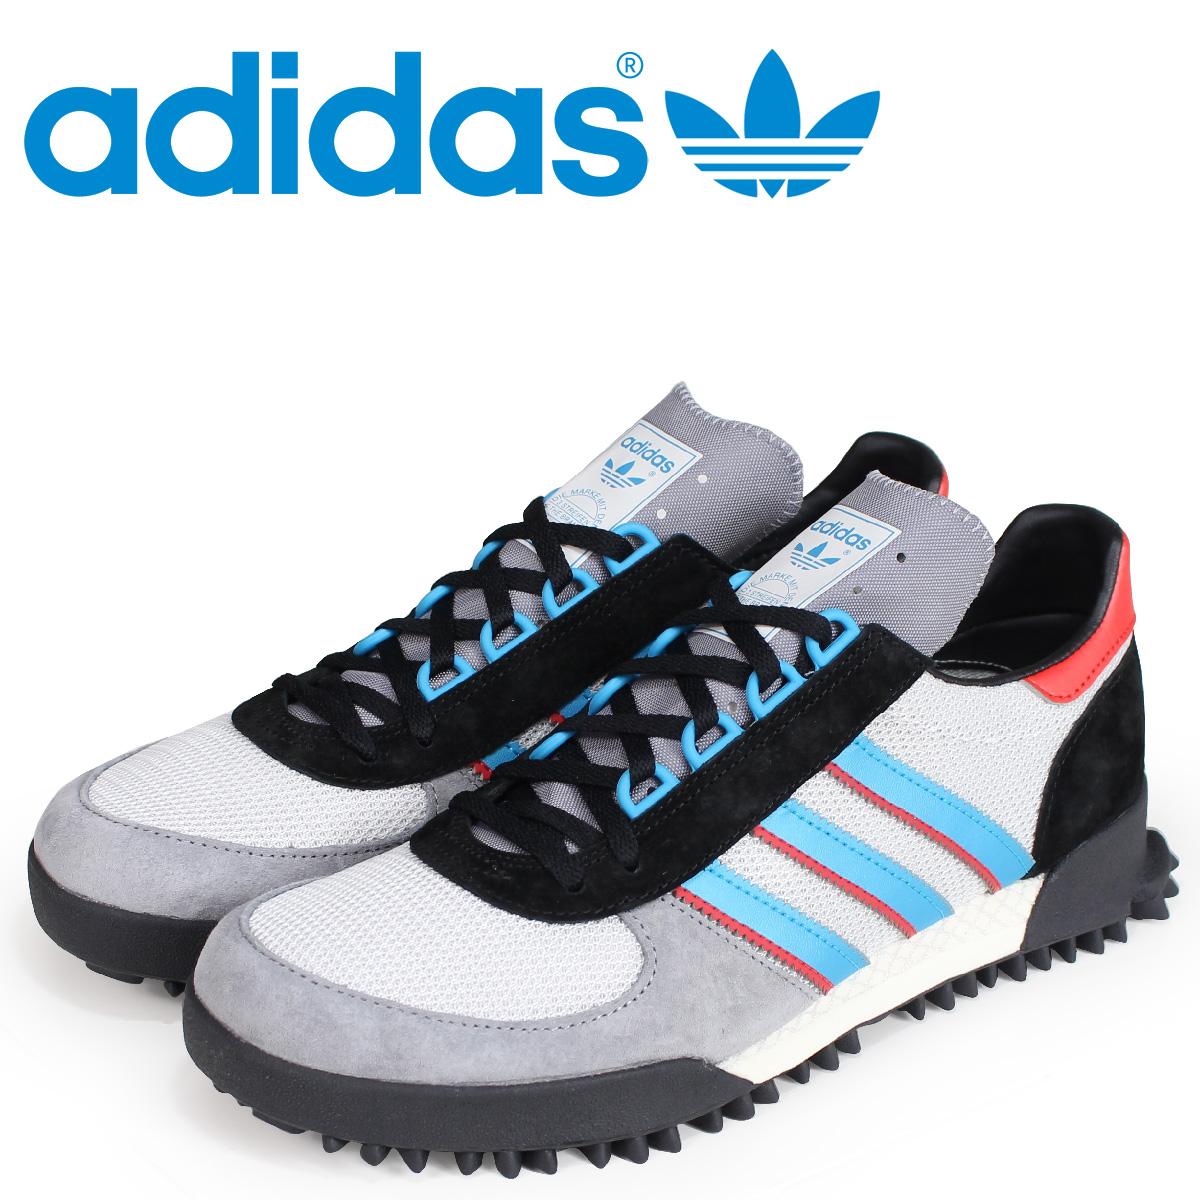 adidas Originals marathon Adidas originals sneakers MARATHON TR men B28134 gray